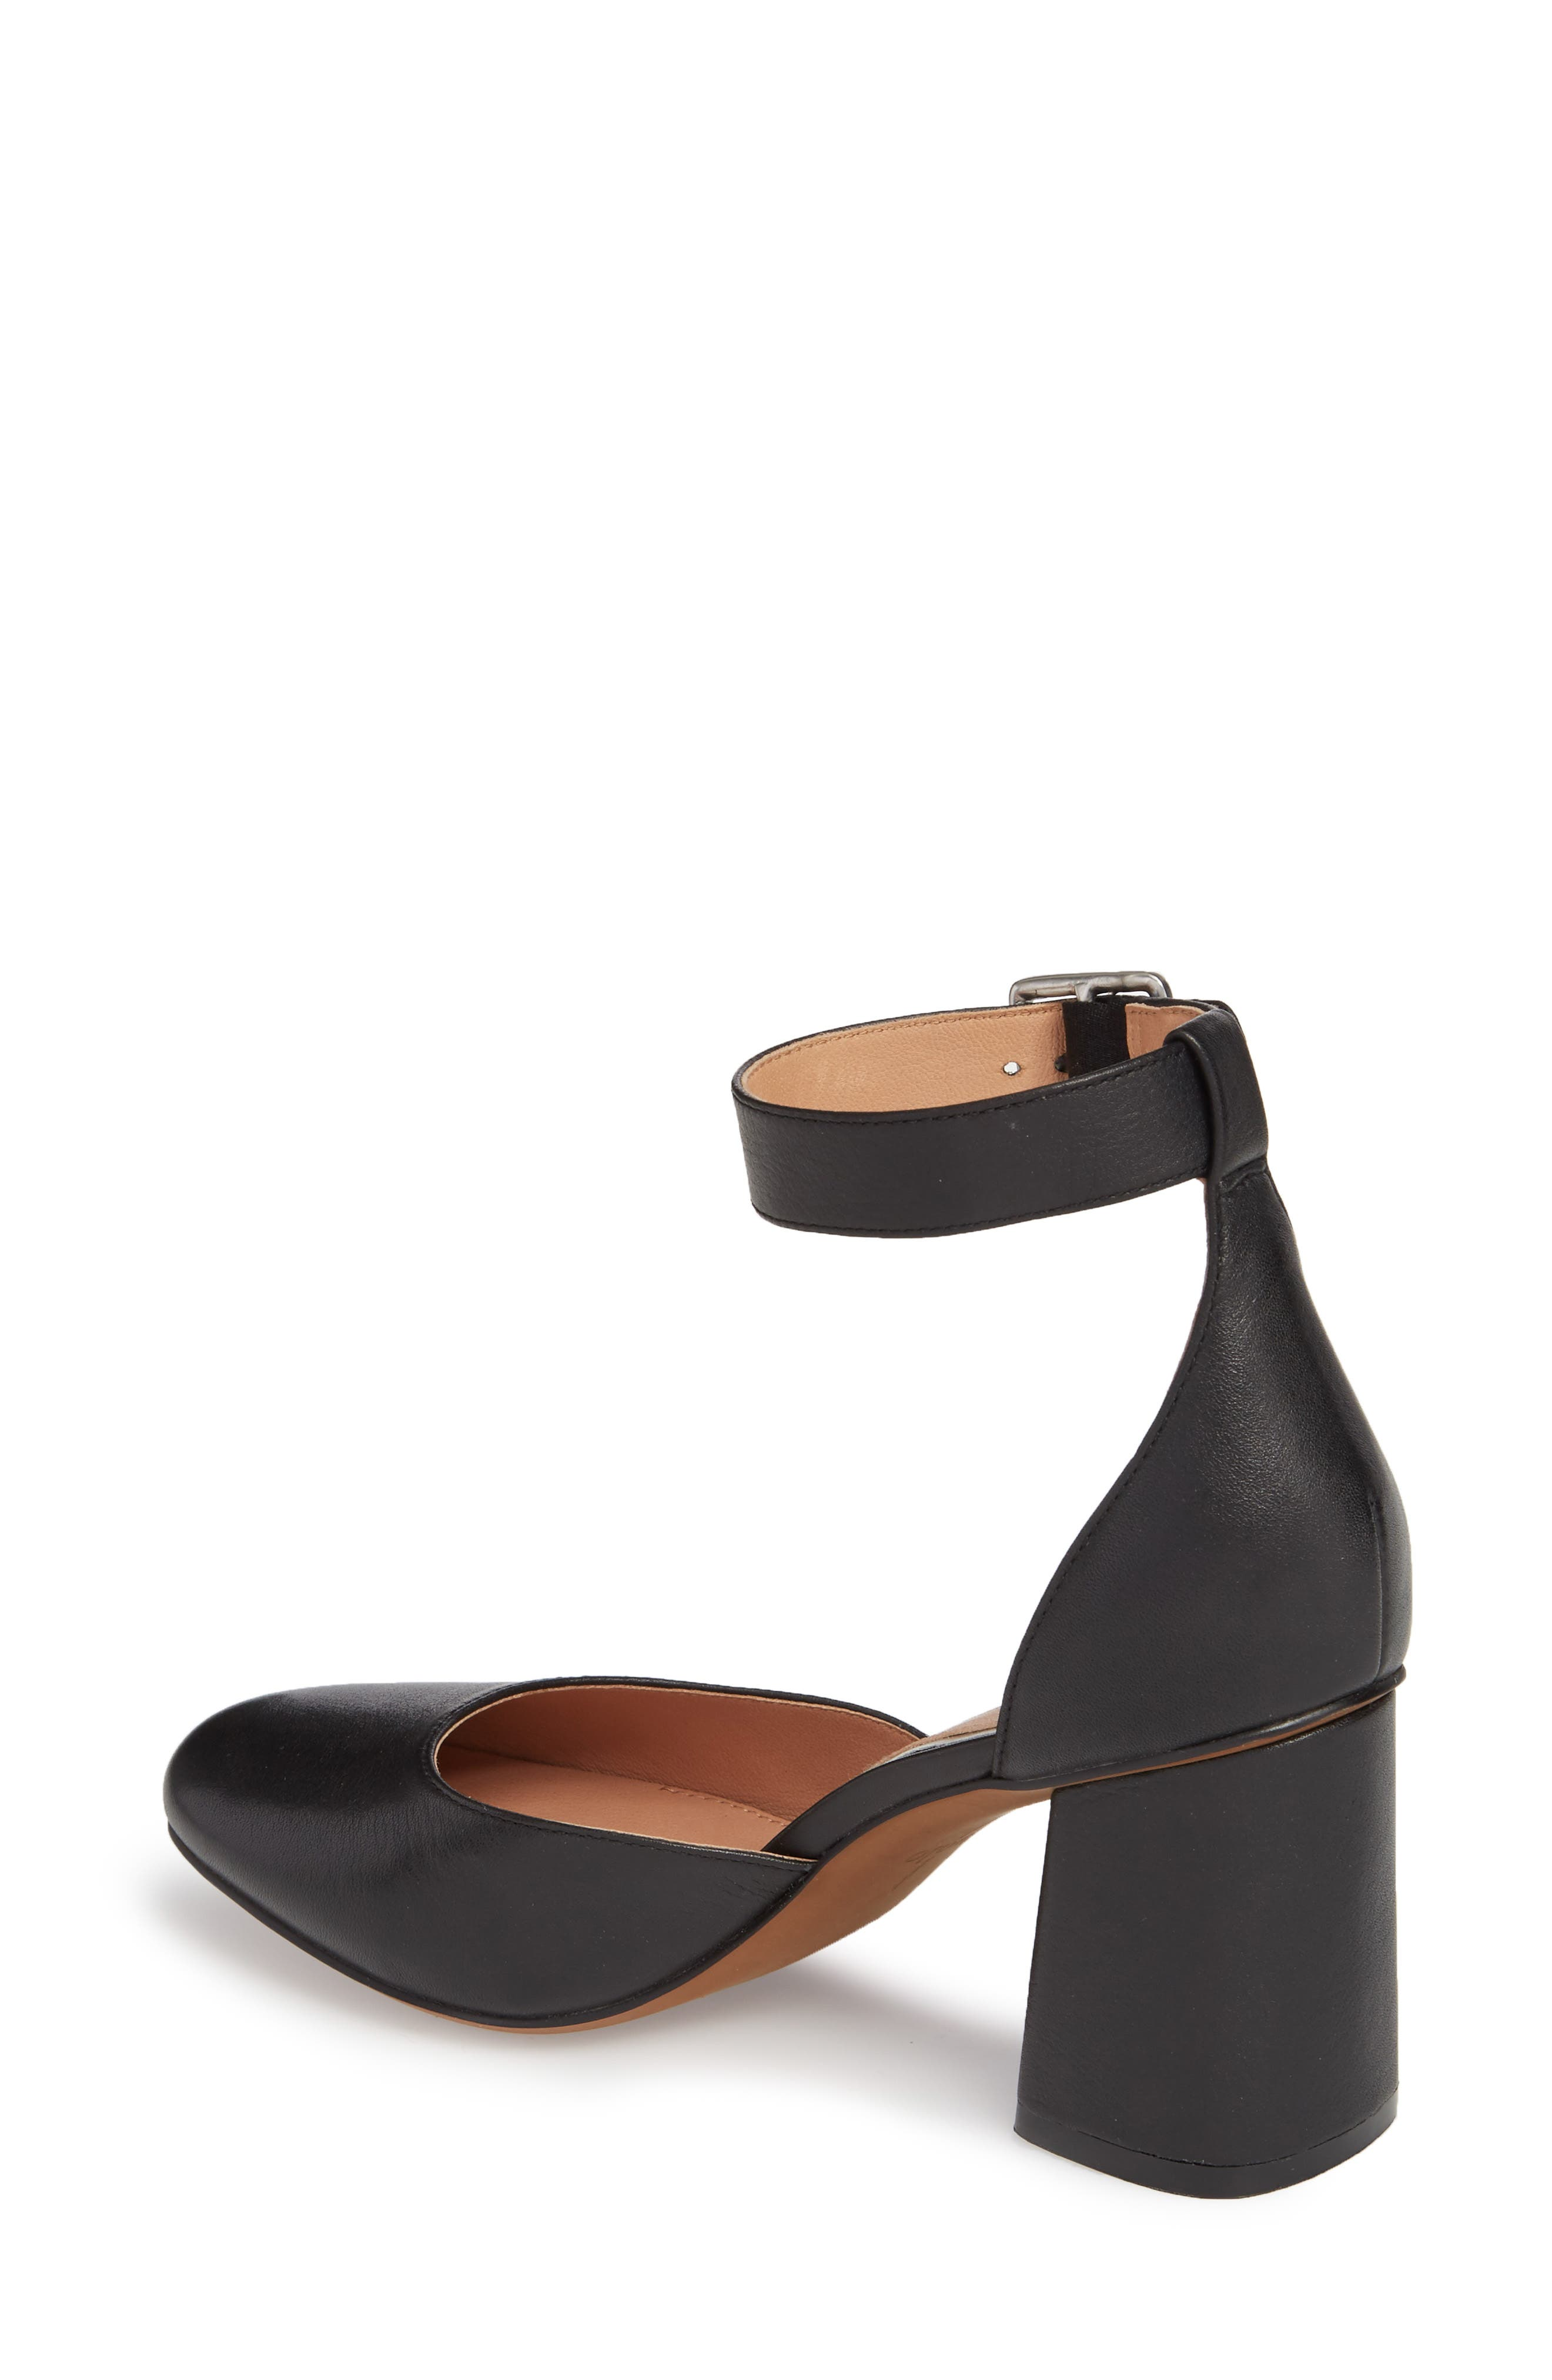 Maya Ankle Strap Pump,                             Alternate thumbnail 2, color,                             Black Leather